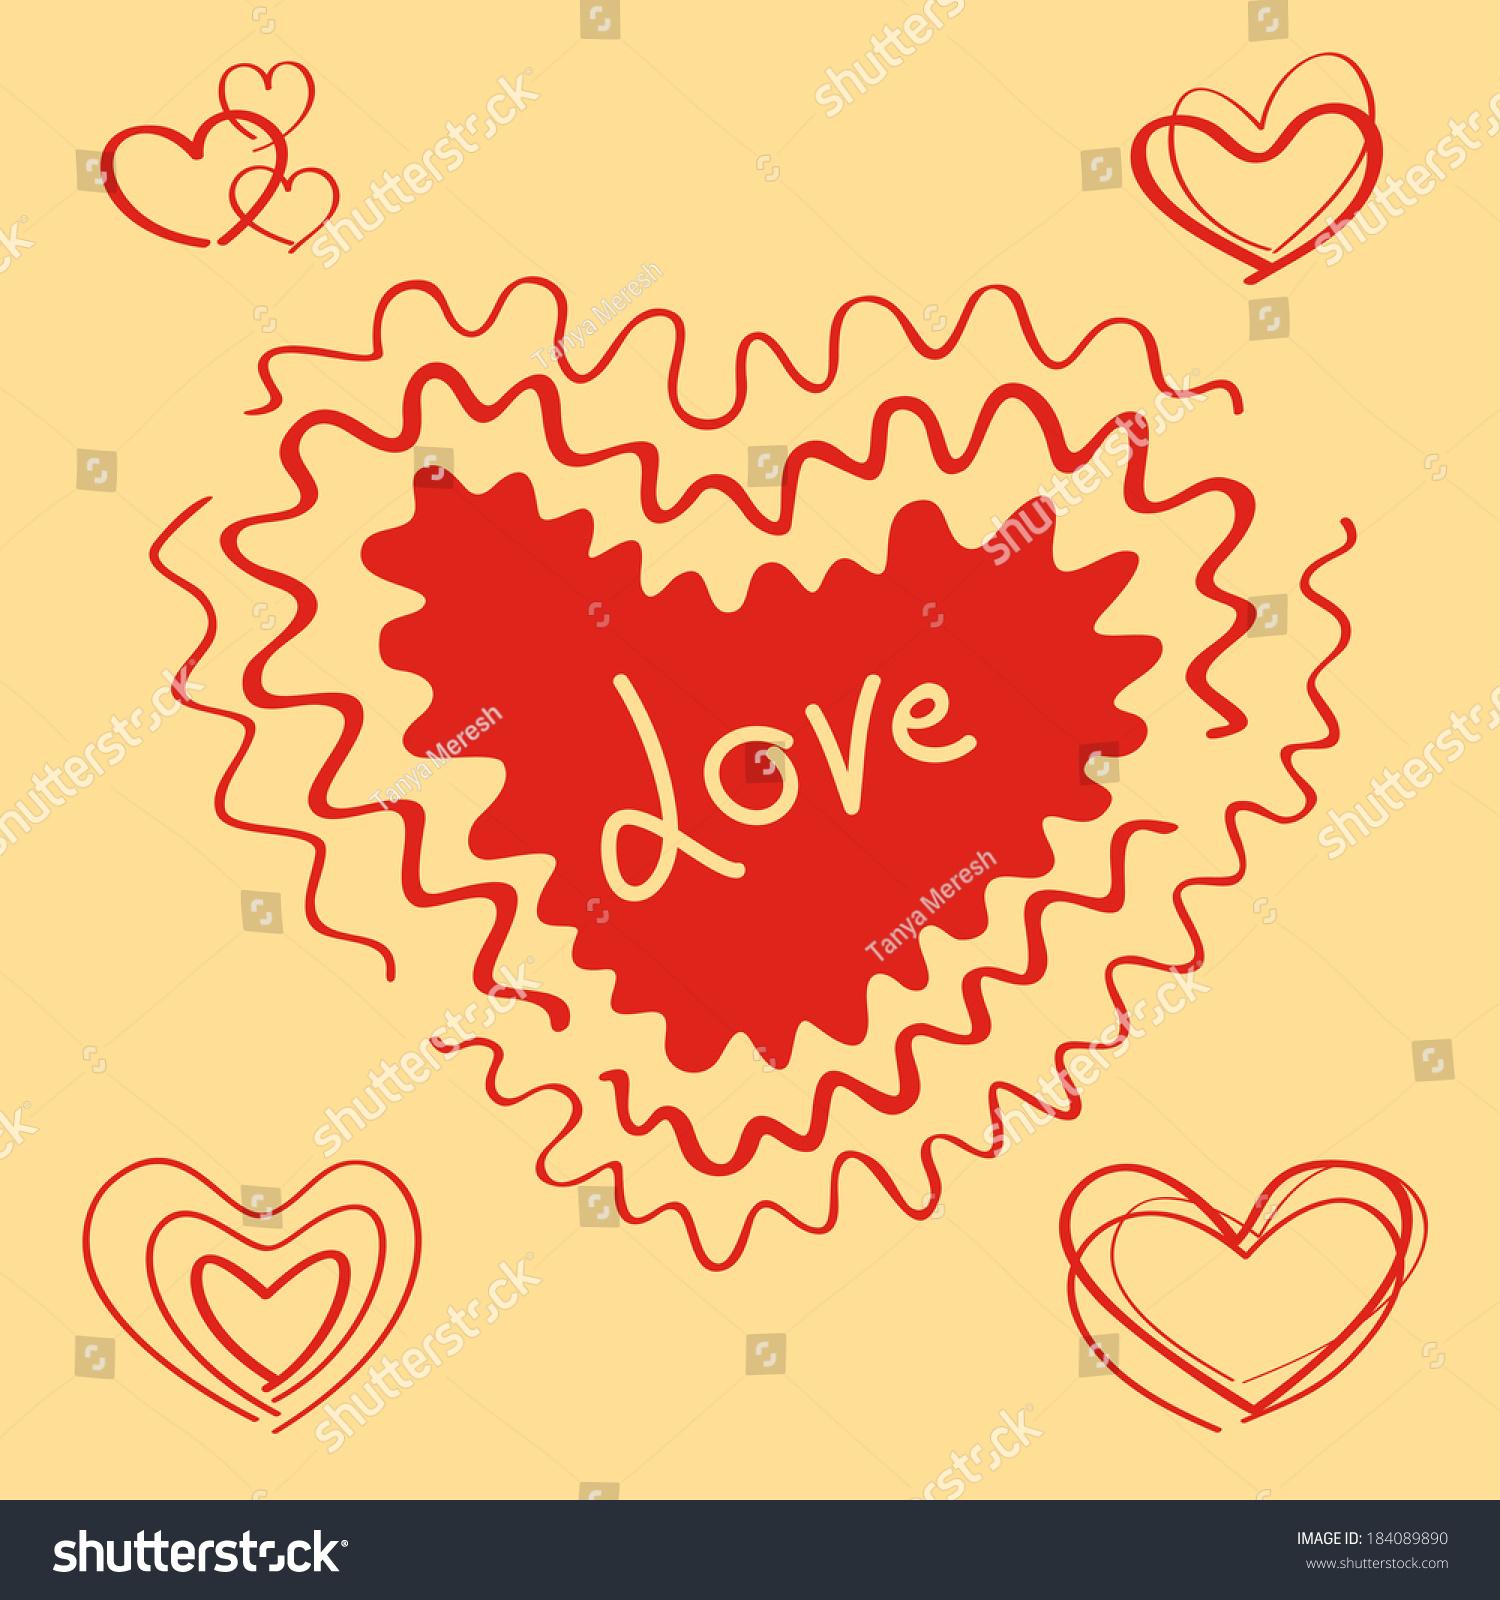 Vector hearts set big heart love stock vector 184089890 shutterstock vector hearts set the big heart with love text buycottarizona Image collections